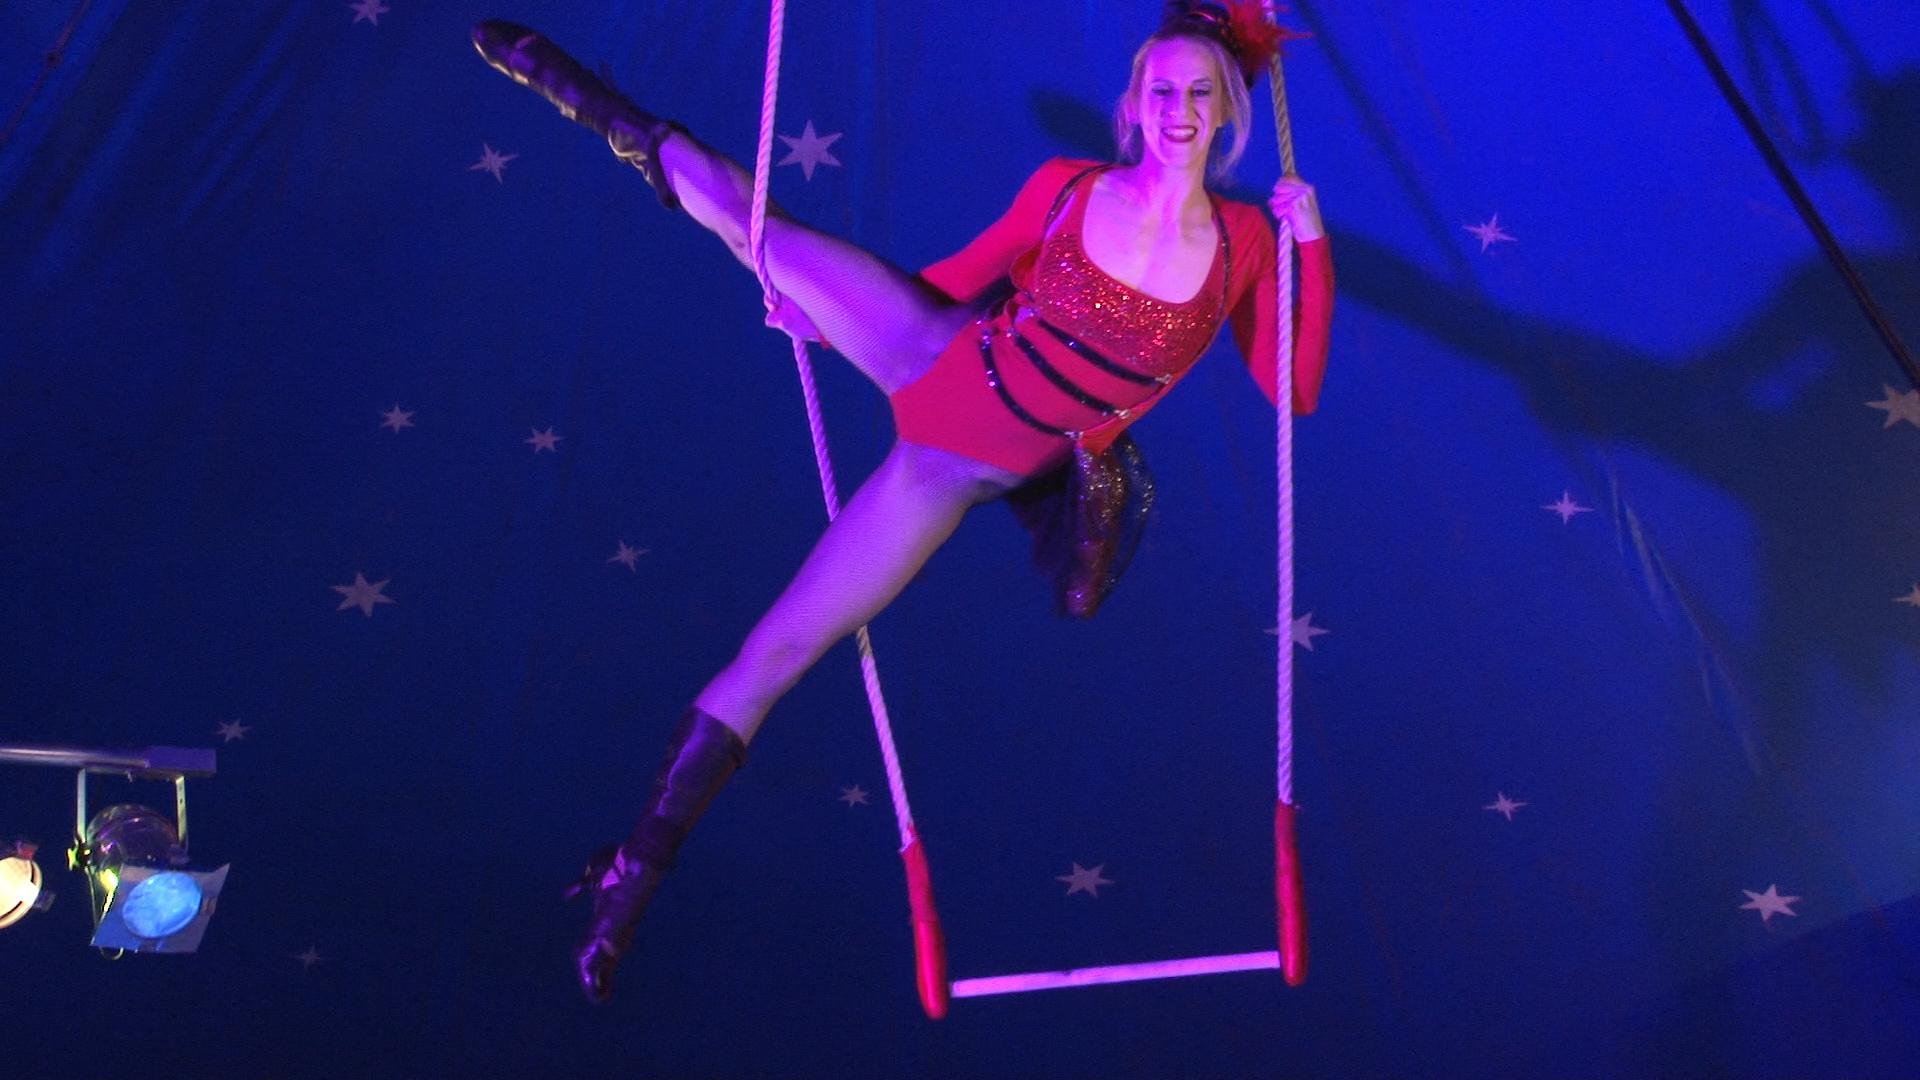 Laura-Cohen-Trapez-Show-circusevents-koeln-.5